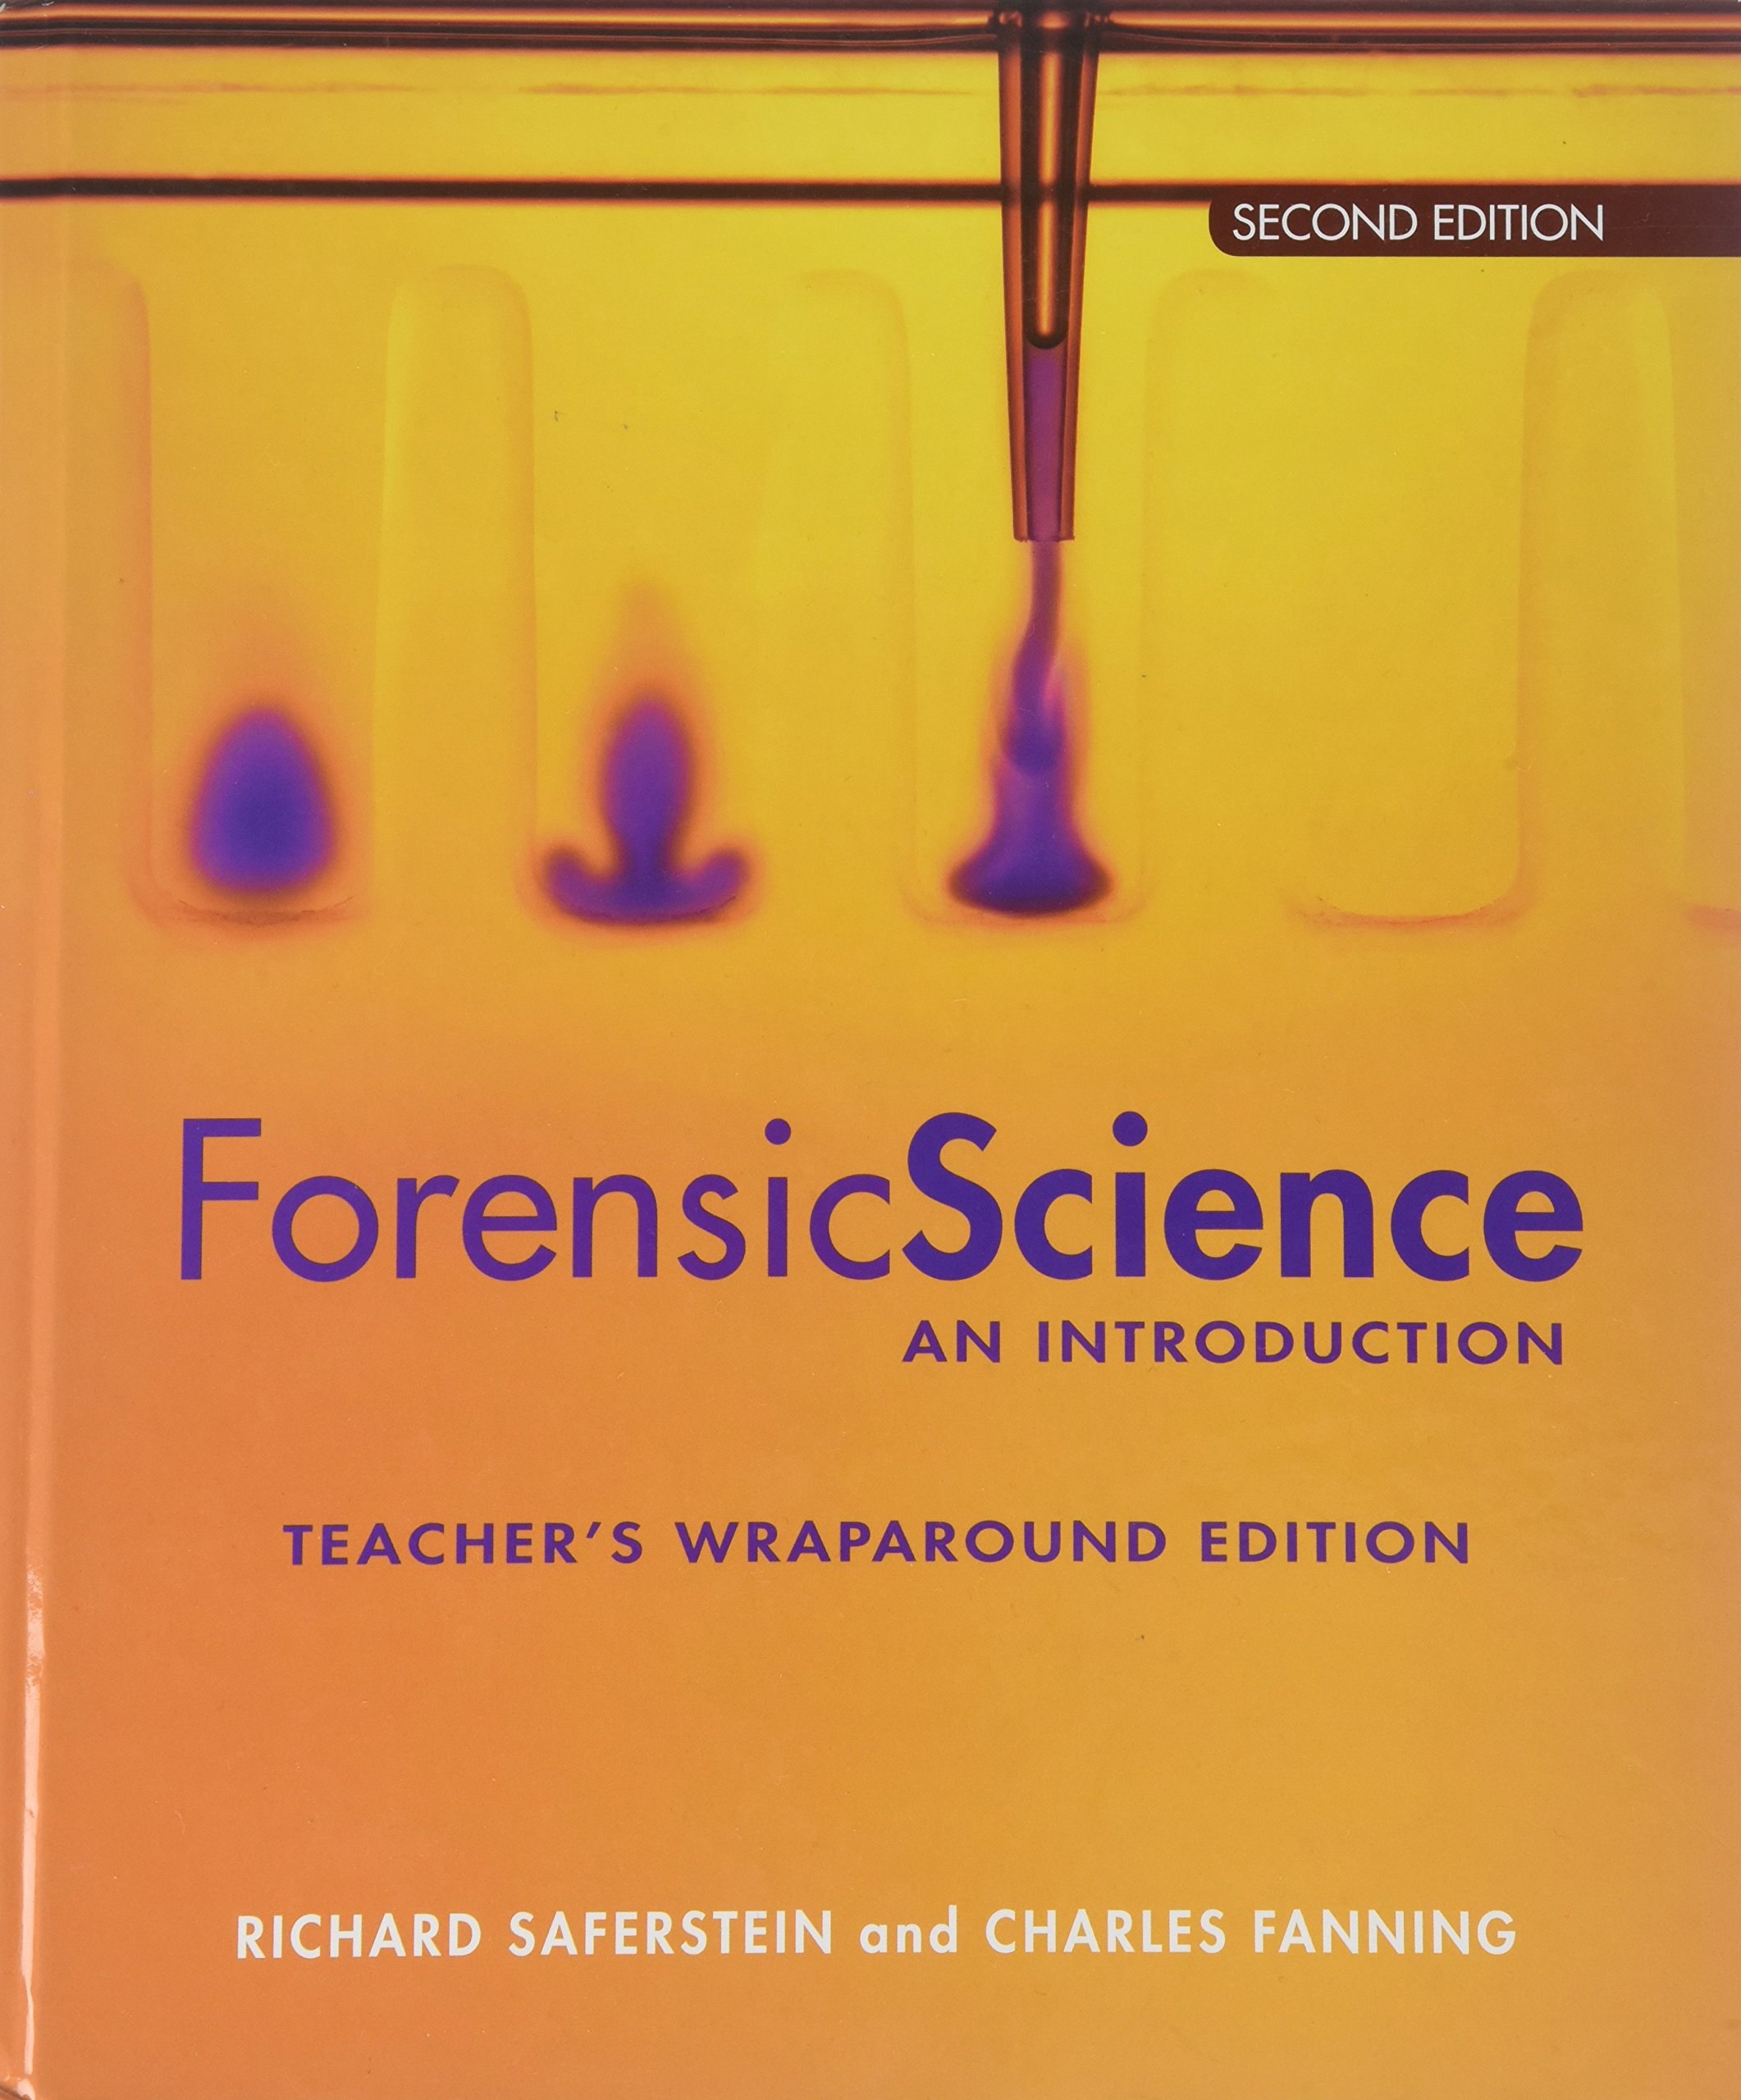 Forensic Science: An Introduction (Teacher's Wraparound Edition) pdf epub